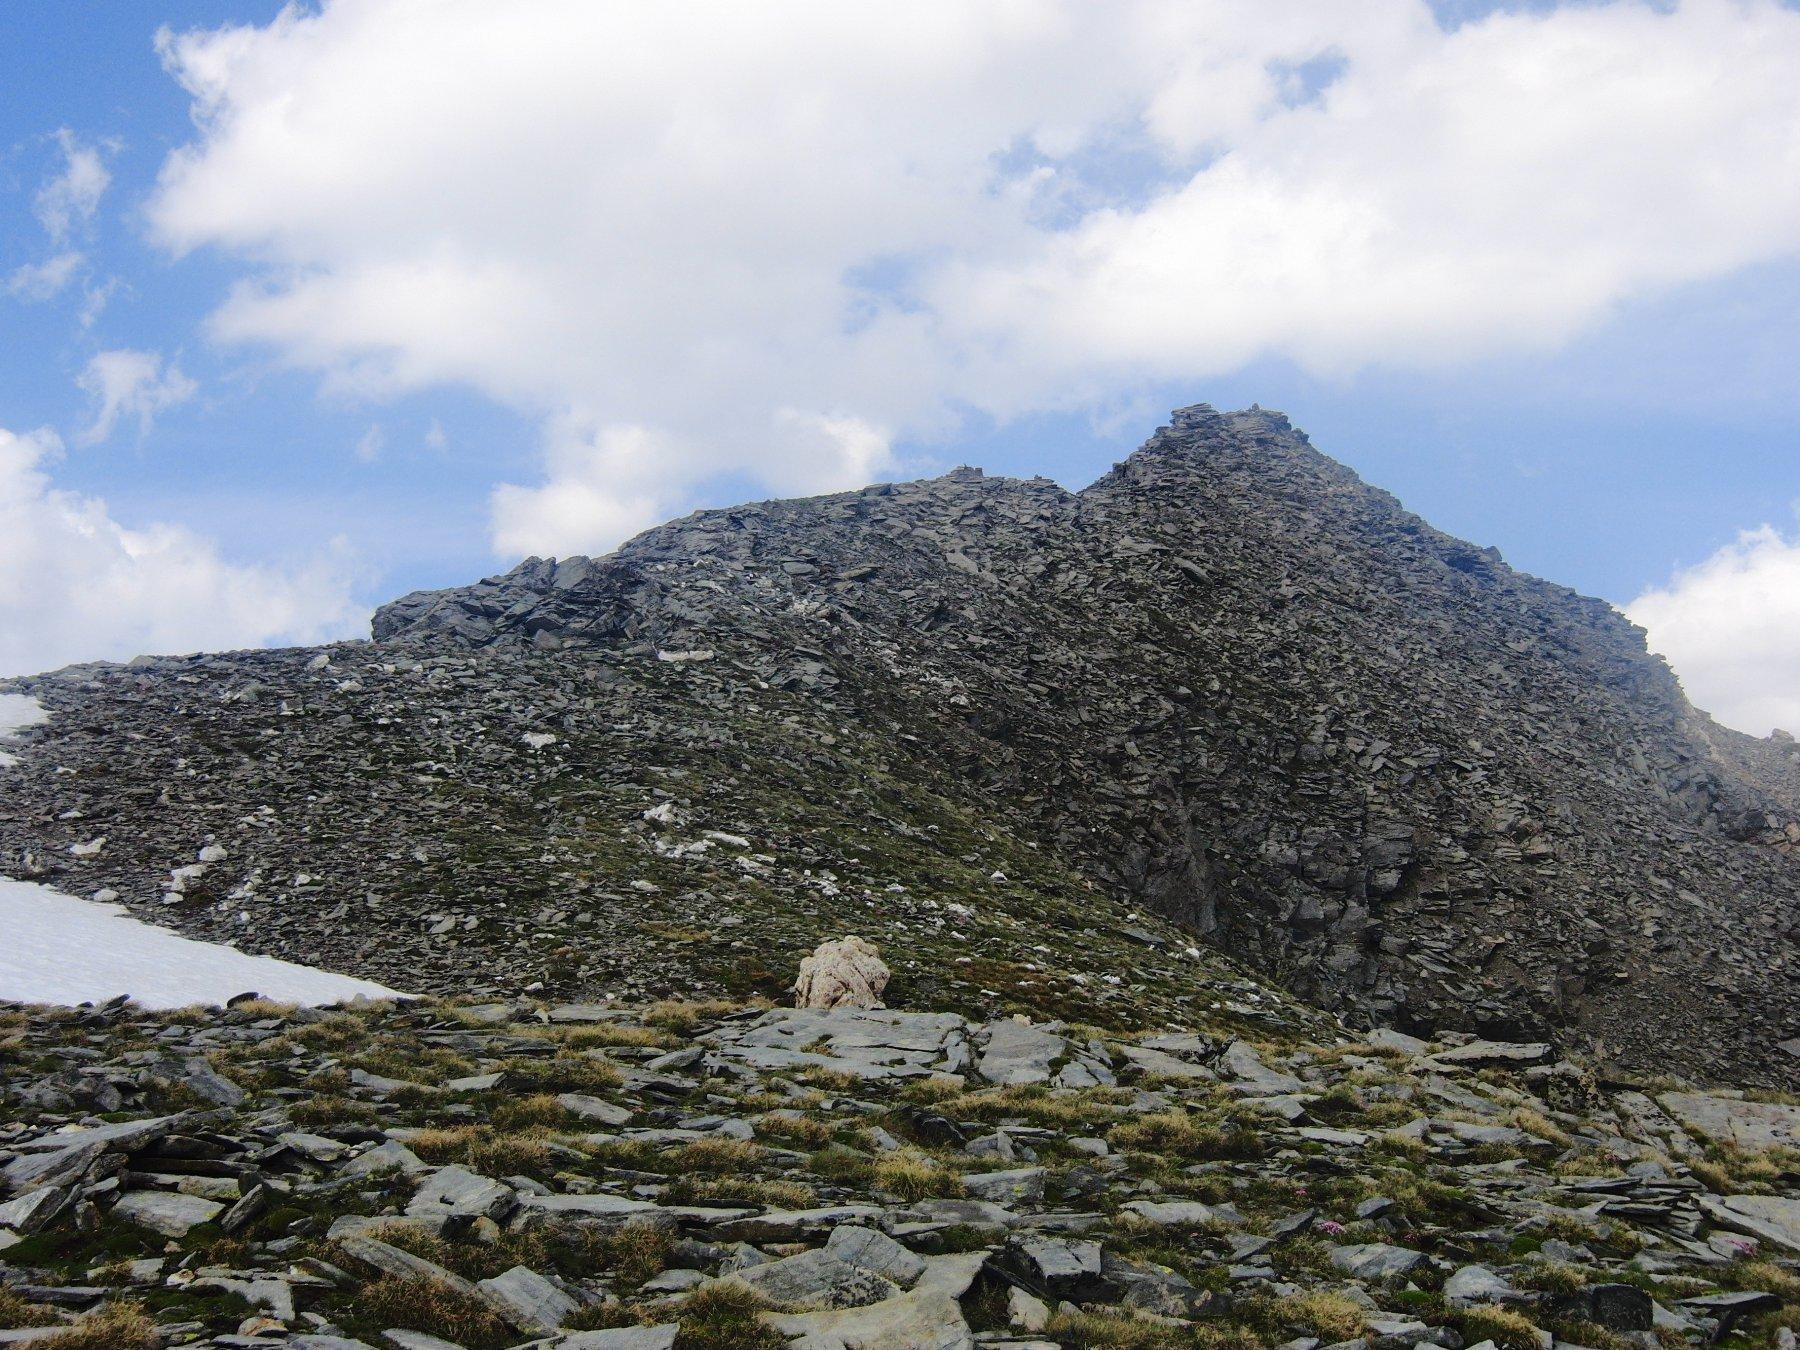 Leynir (Punta) dai Piani del Nivolet per il Col Rosset 2017-06-24